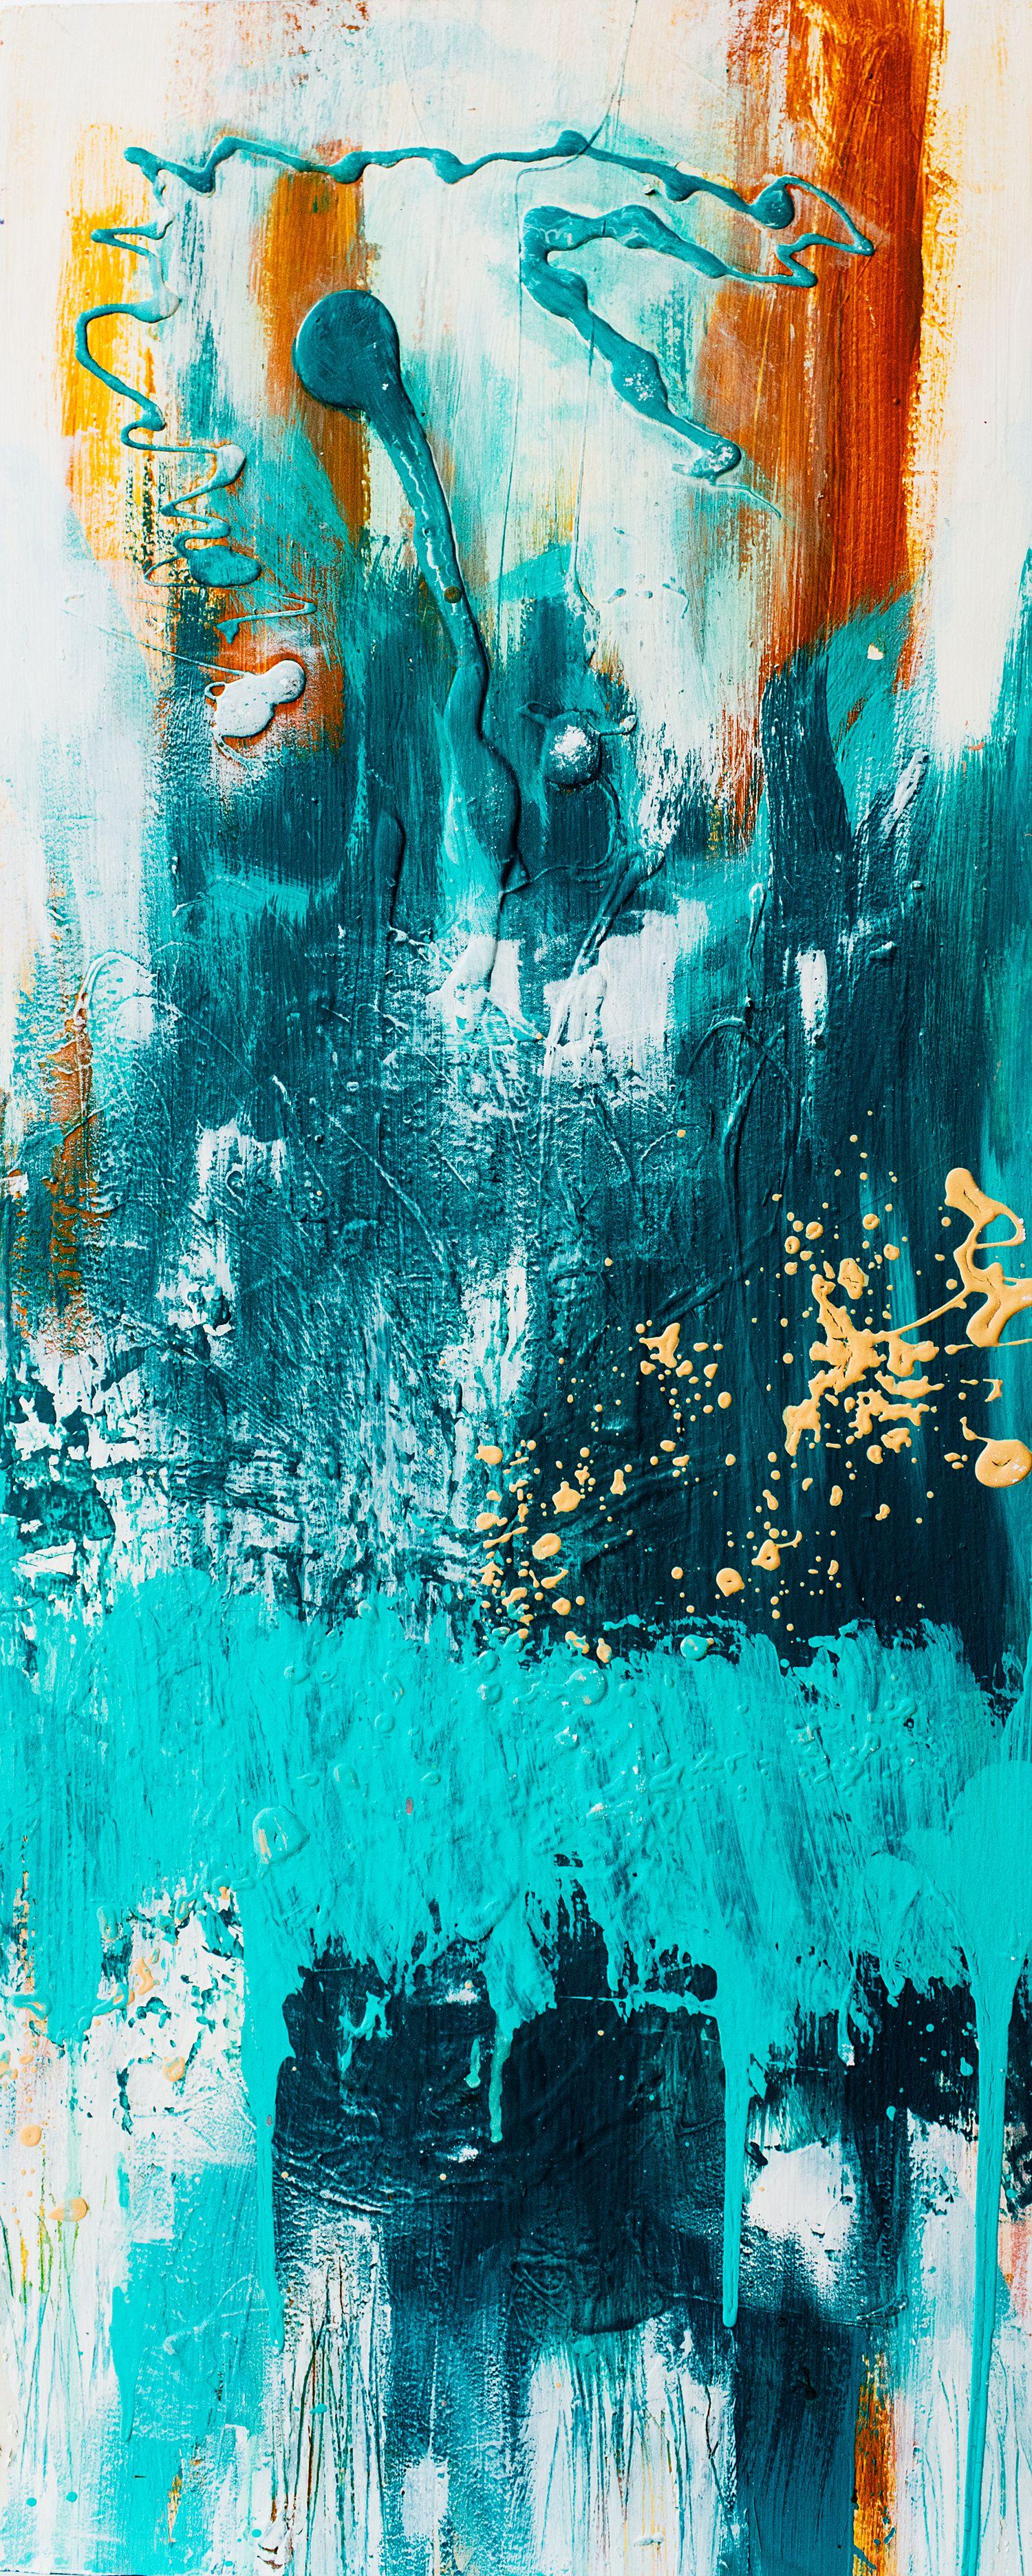 Cha Wilde Paintings - February 2019-3_WEB.jpg